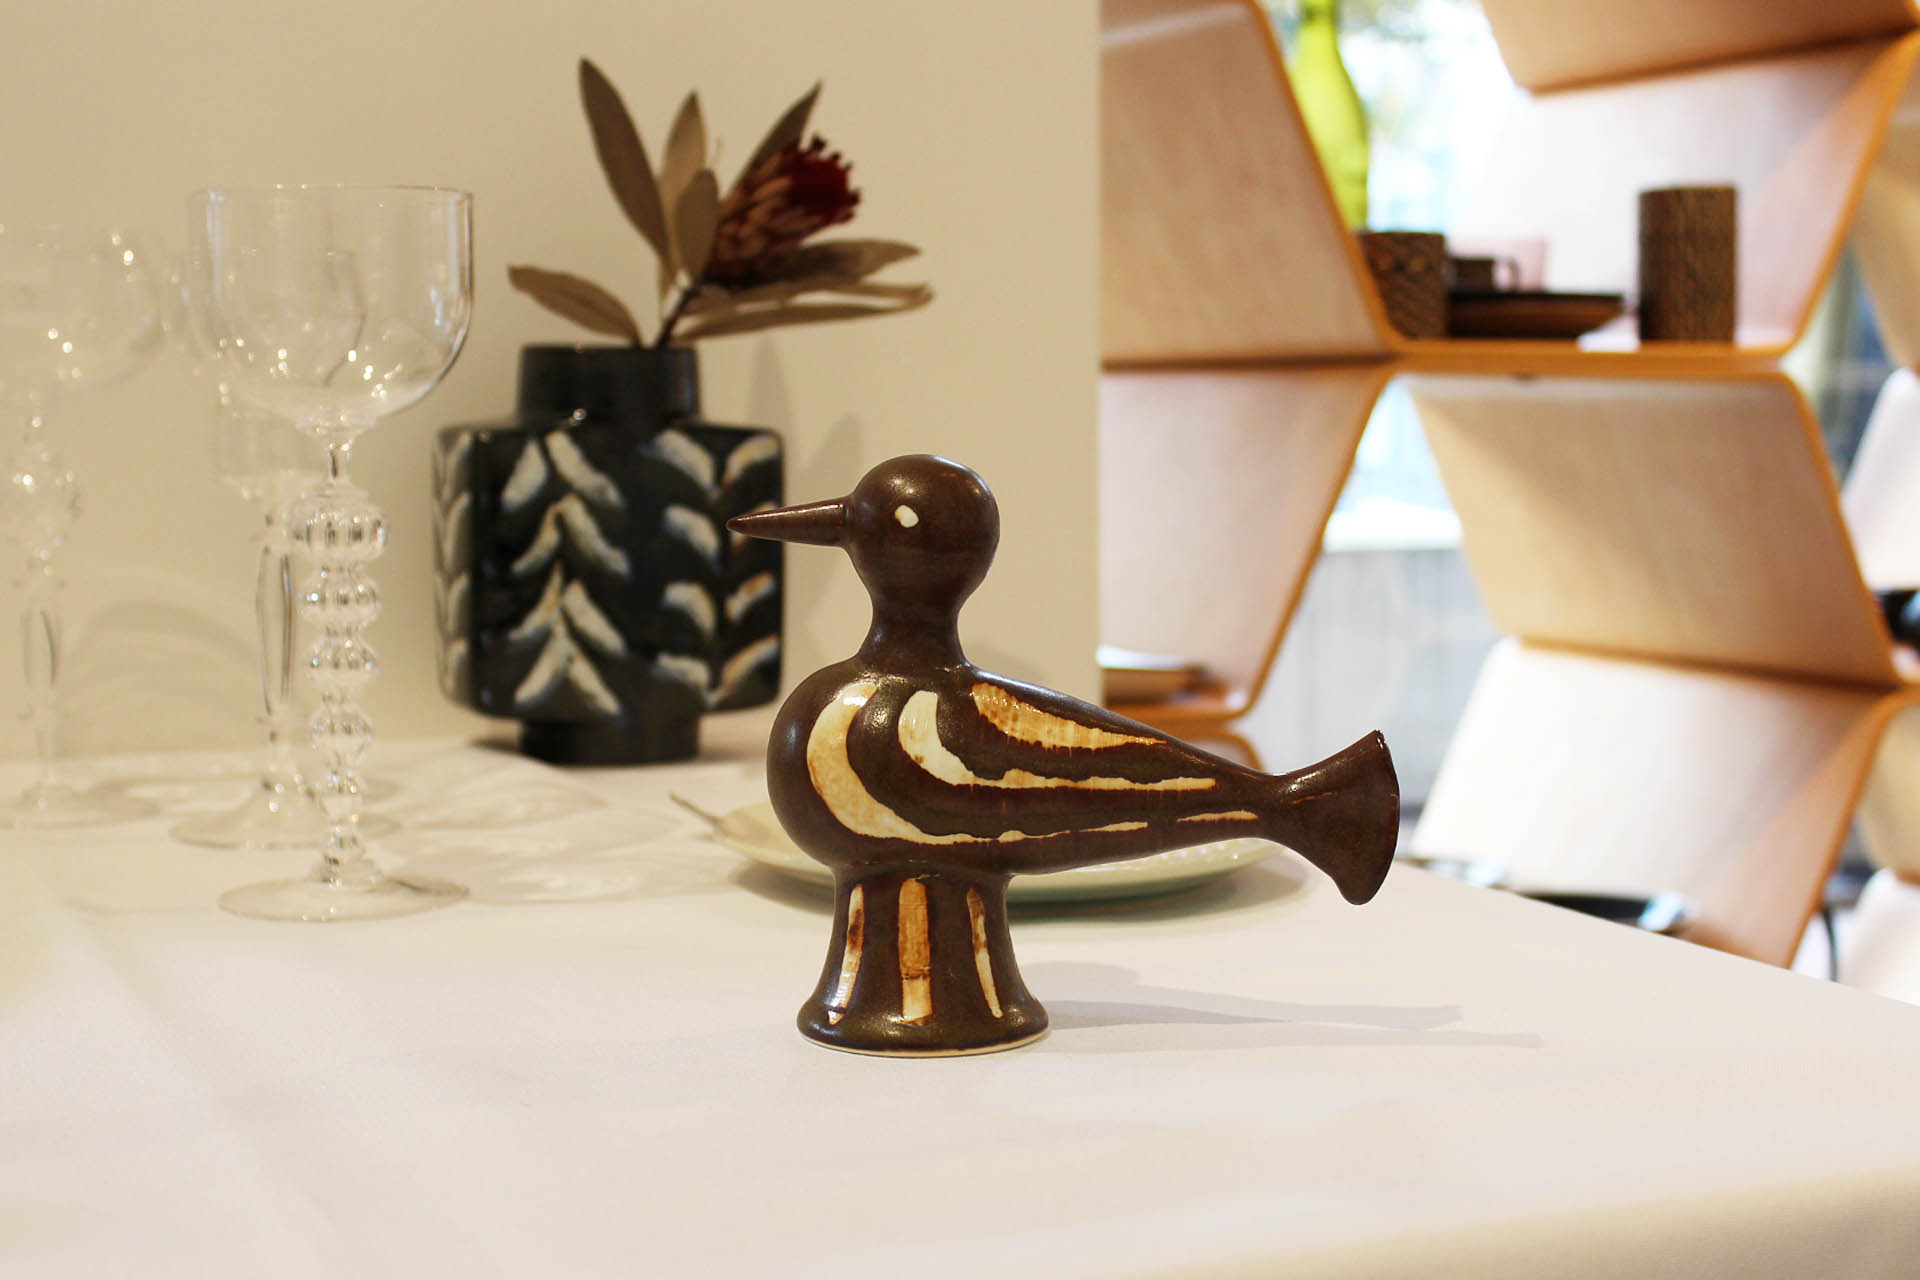 画像1: Pebble Ceramic Design Studio Brick Bird M-02 (1)